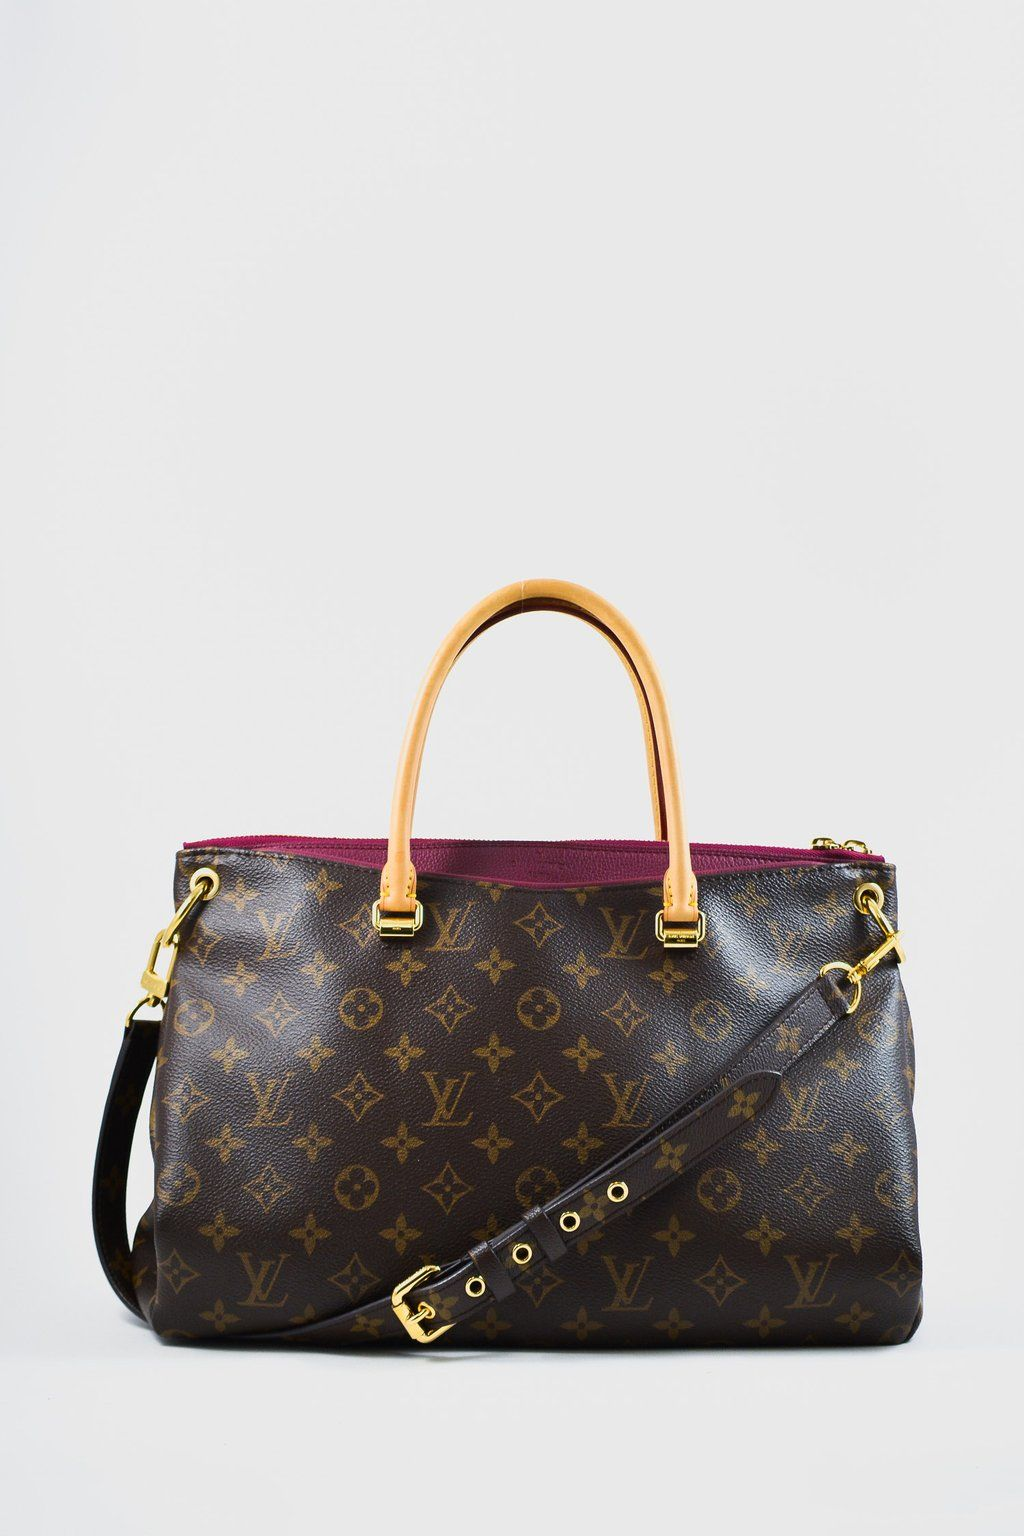 3071b172ce0c Louis Vuitton Monogram Pallas Tote GM in